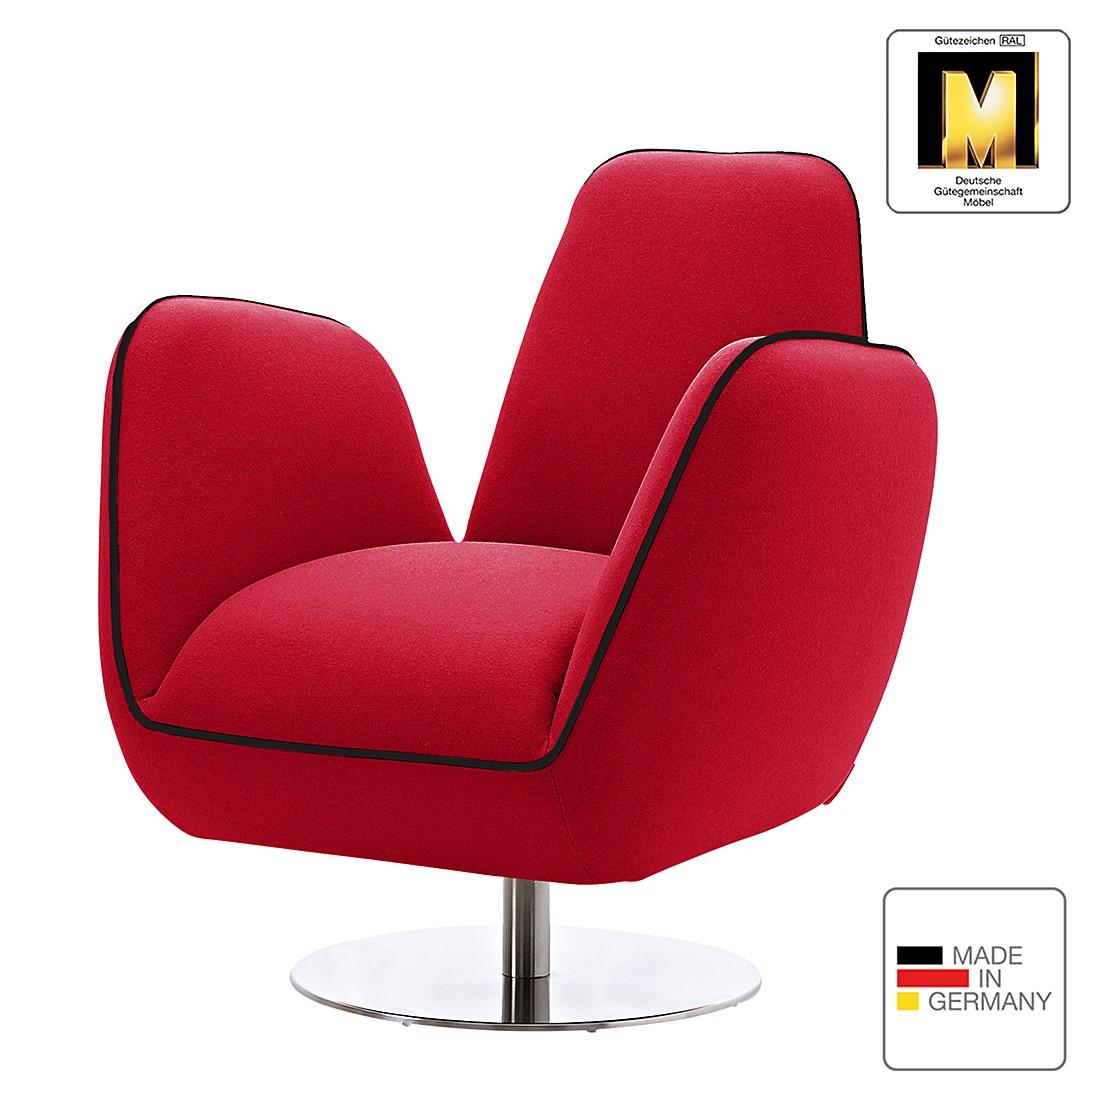 Home 24 - Fauteuil pinto i - tissu - rouge / noir, machalke polsterwerkstätten